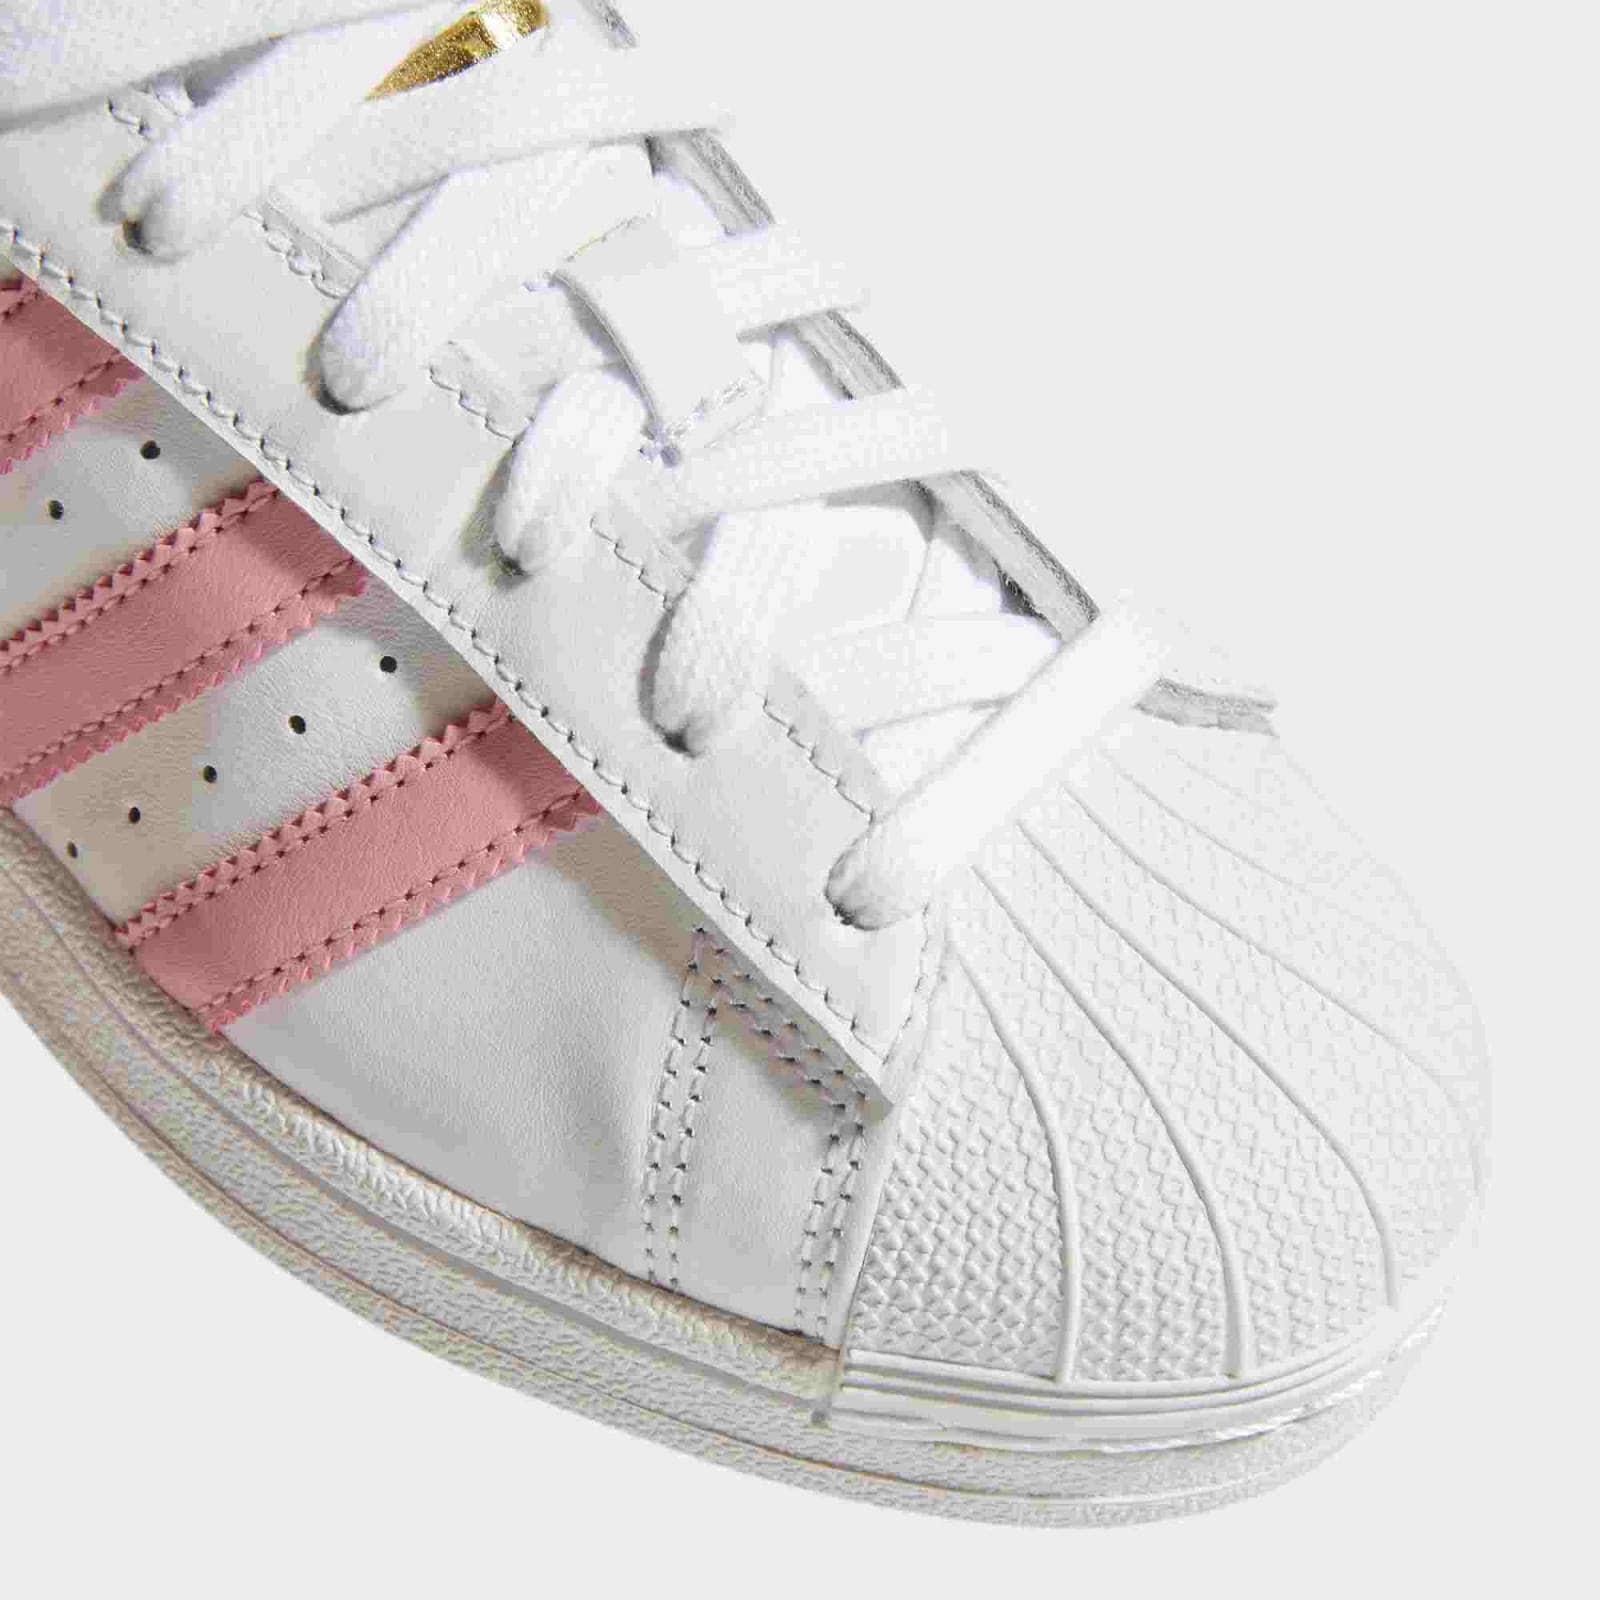 apuntalar preparar matriz  Tenis Adidas Originals Superstar Mujer Clasico Casual